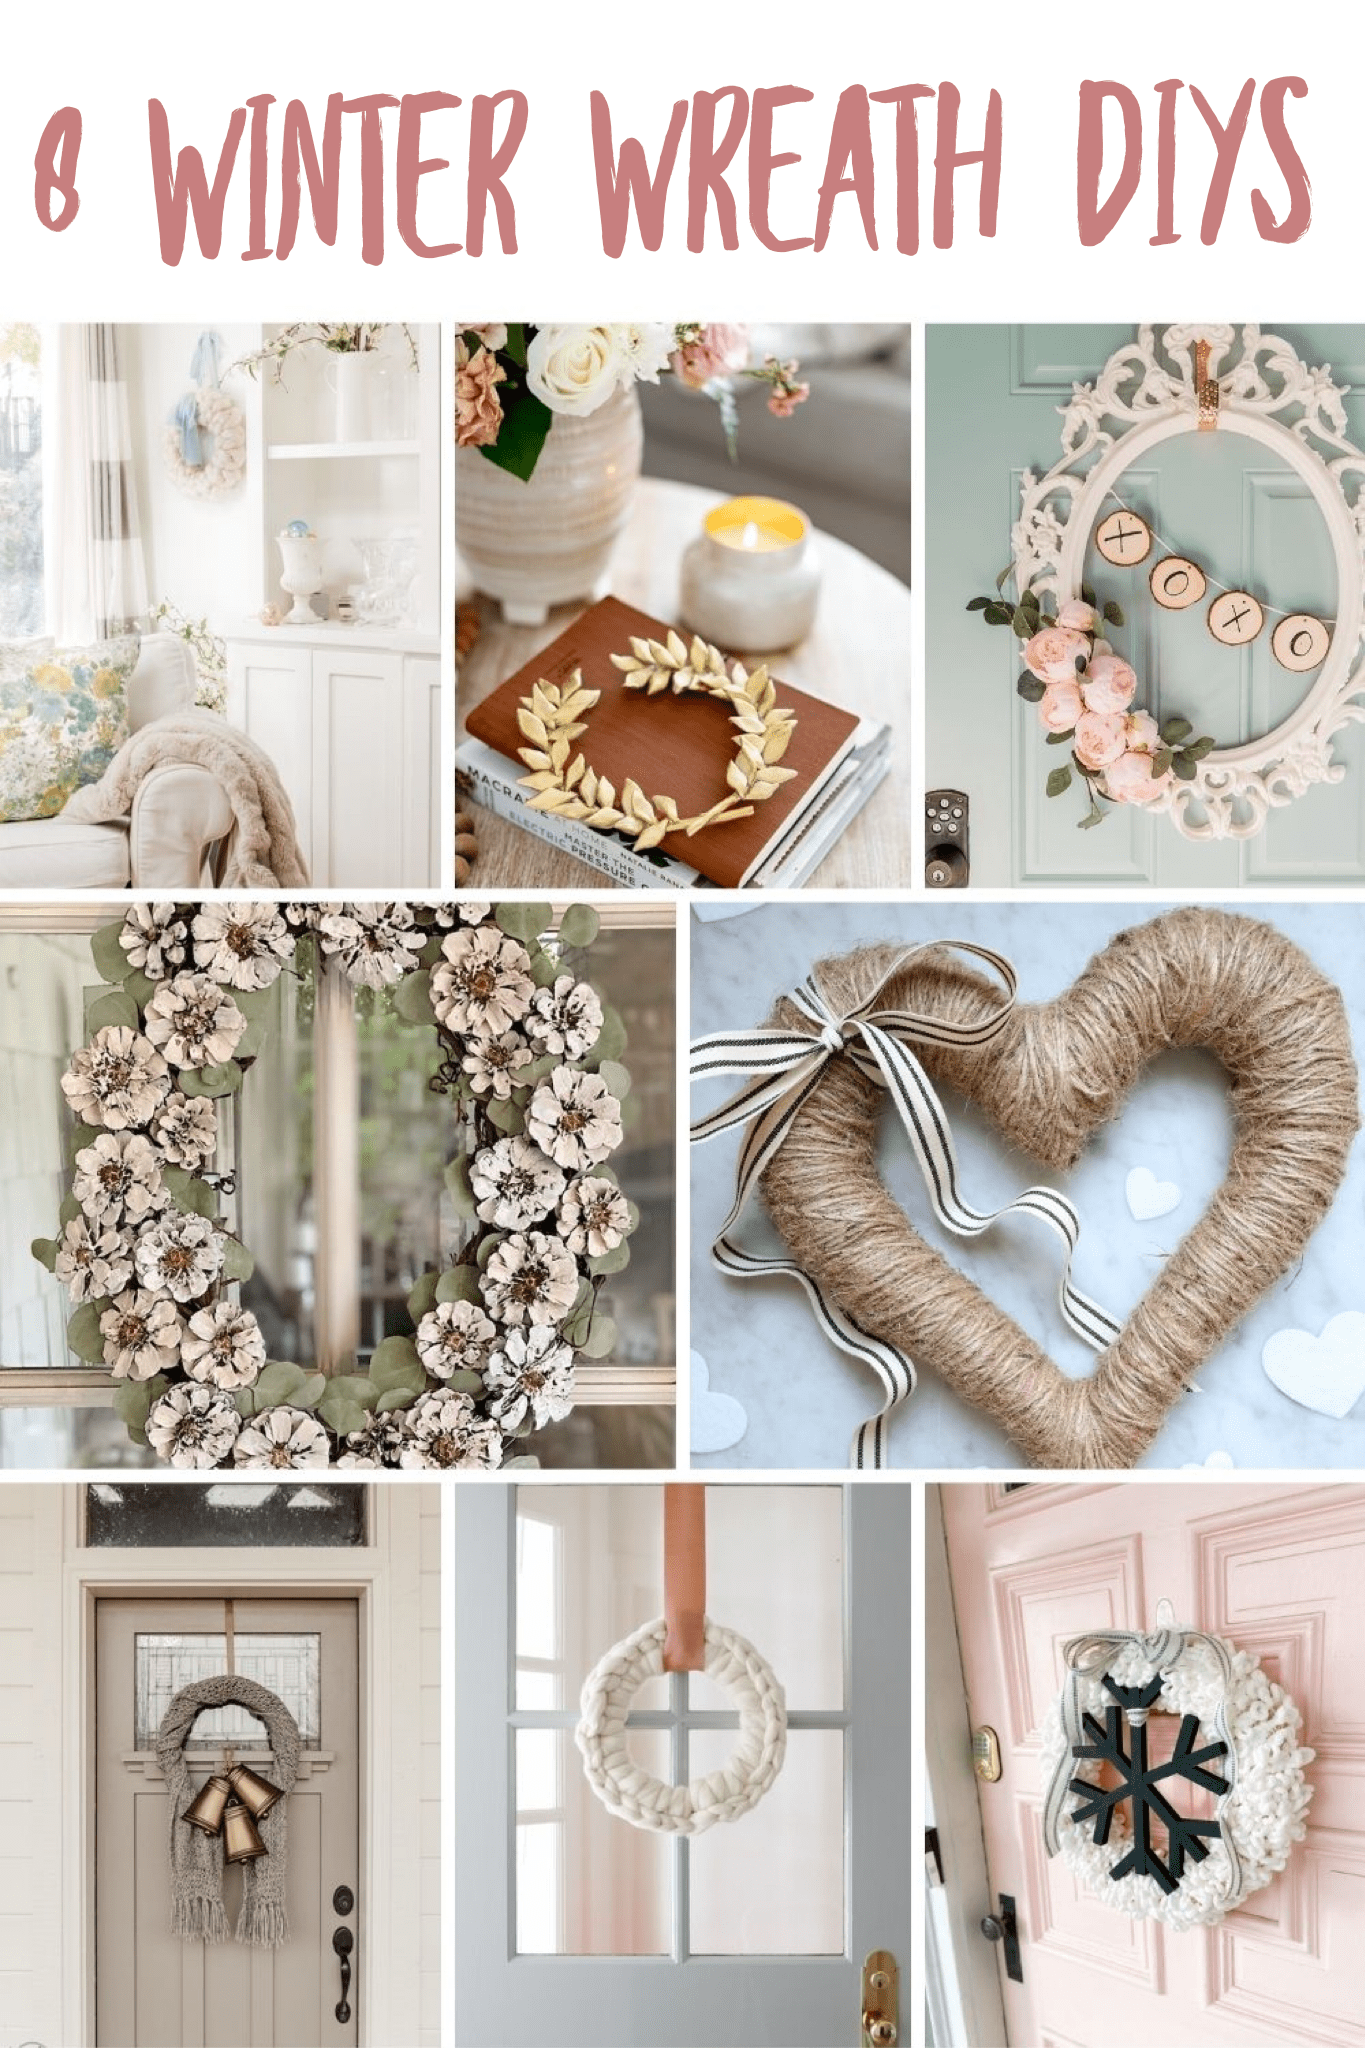 8 winter diy wreaths via @modernglamhome